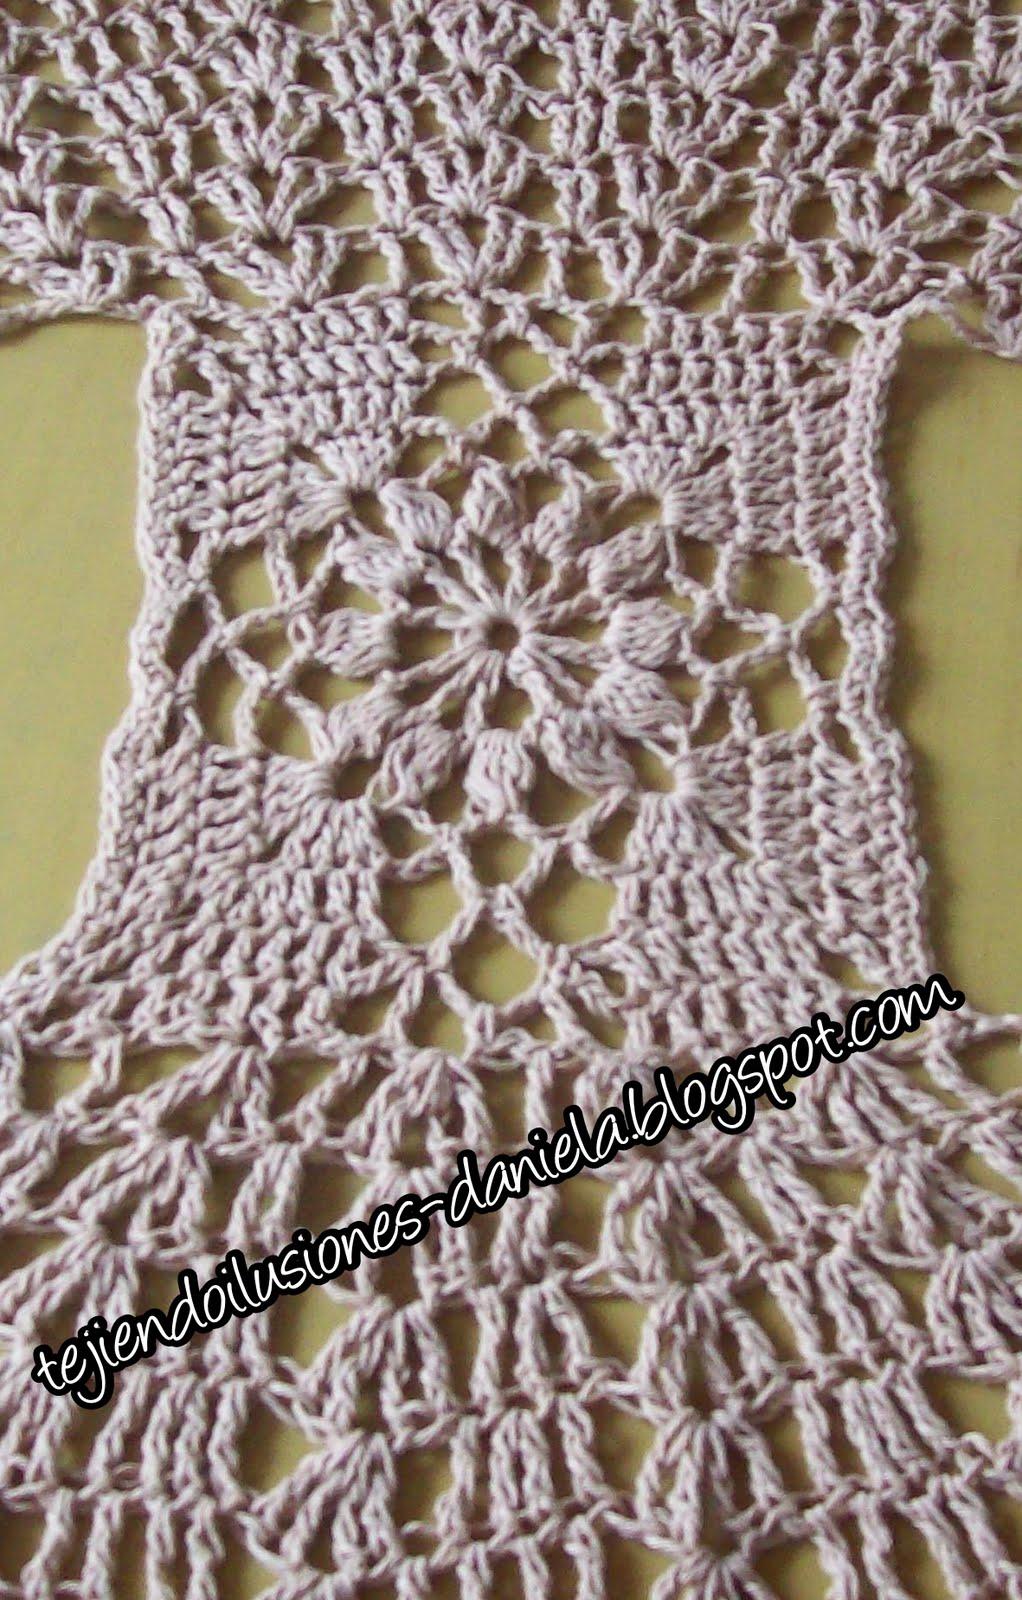 tejido crochet y artesan as chalecos redondos